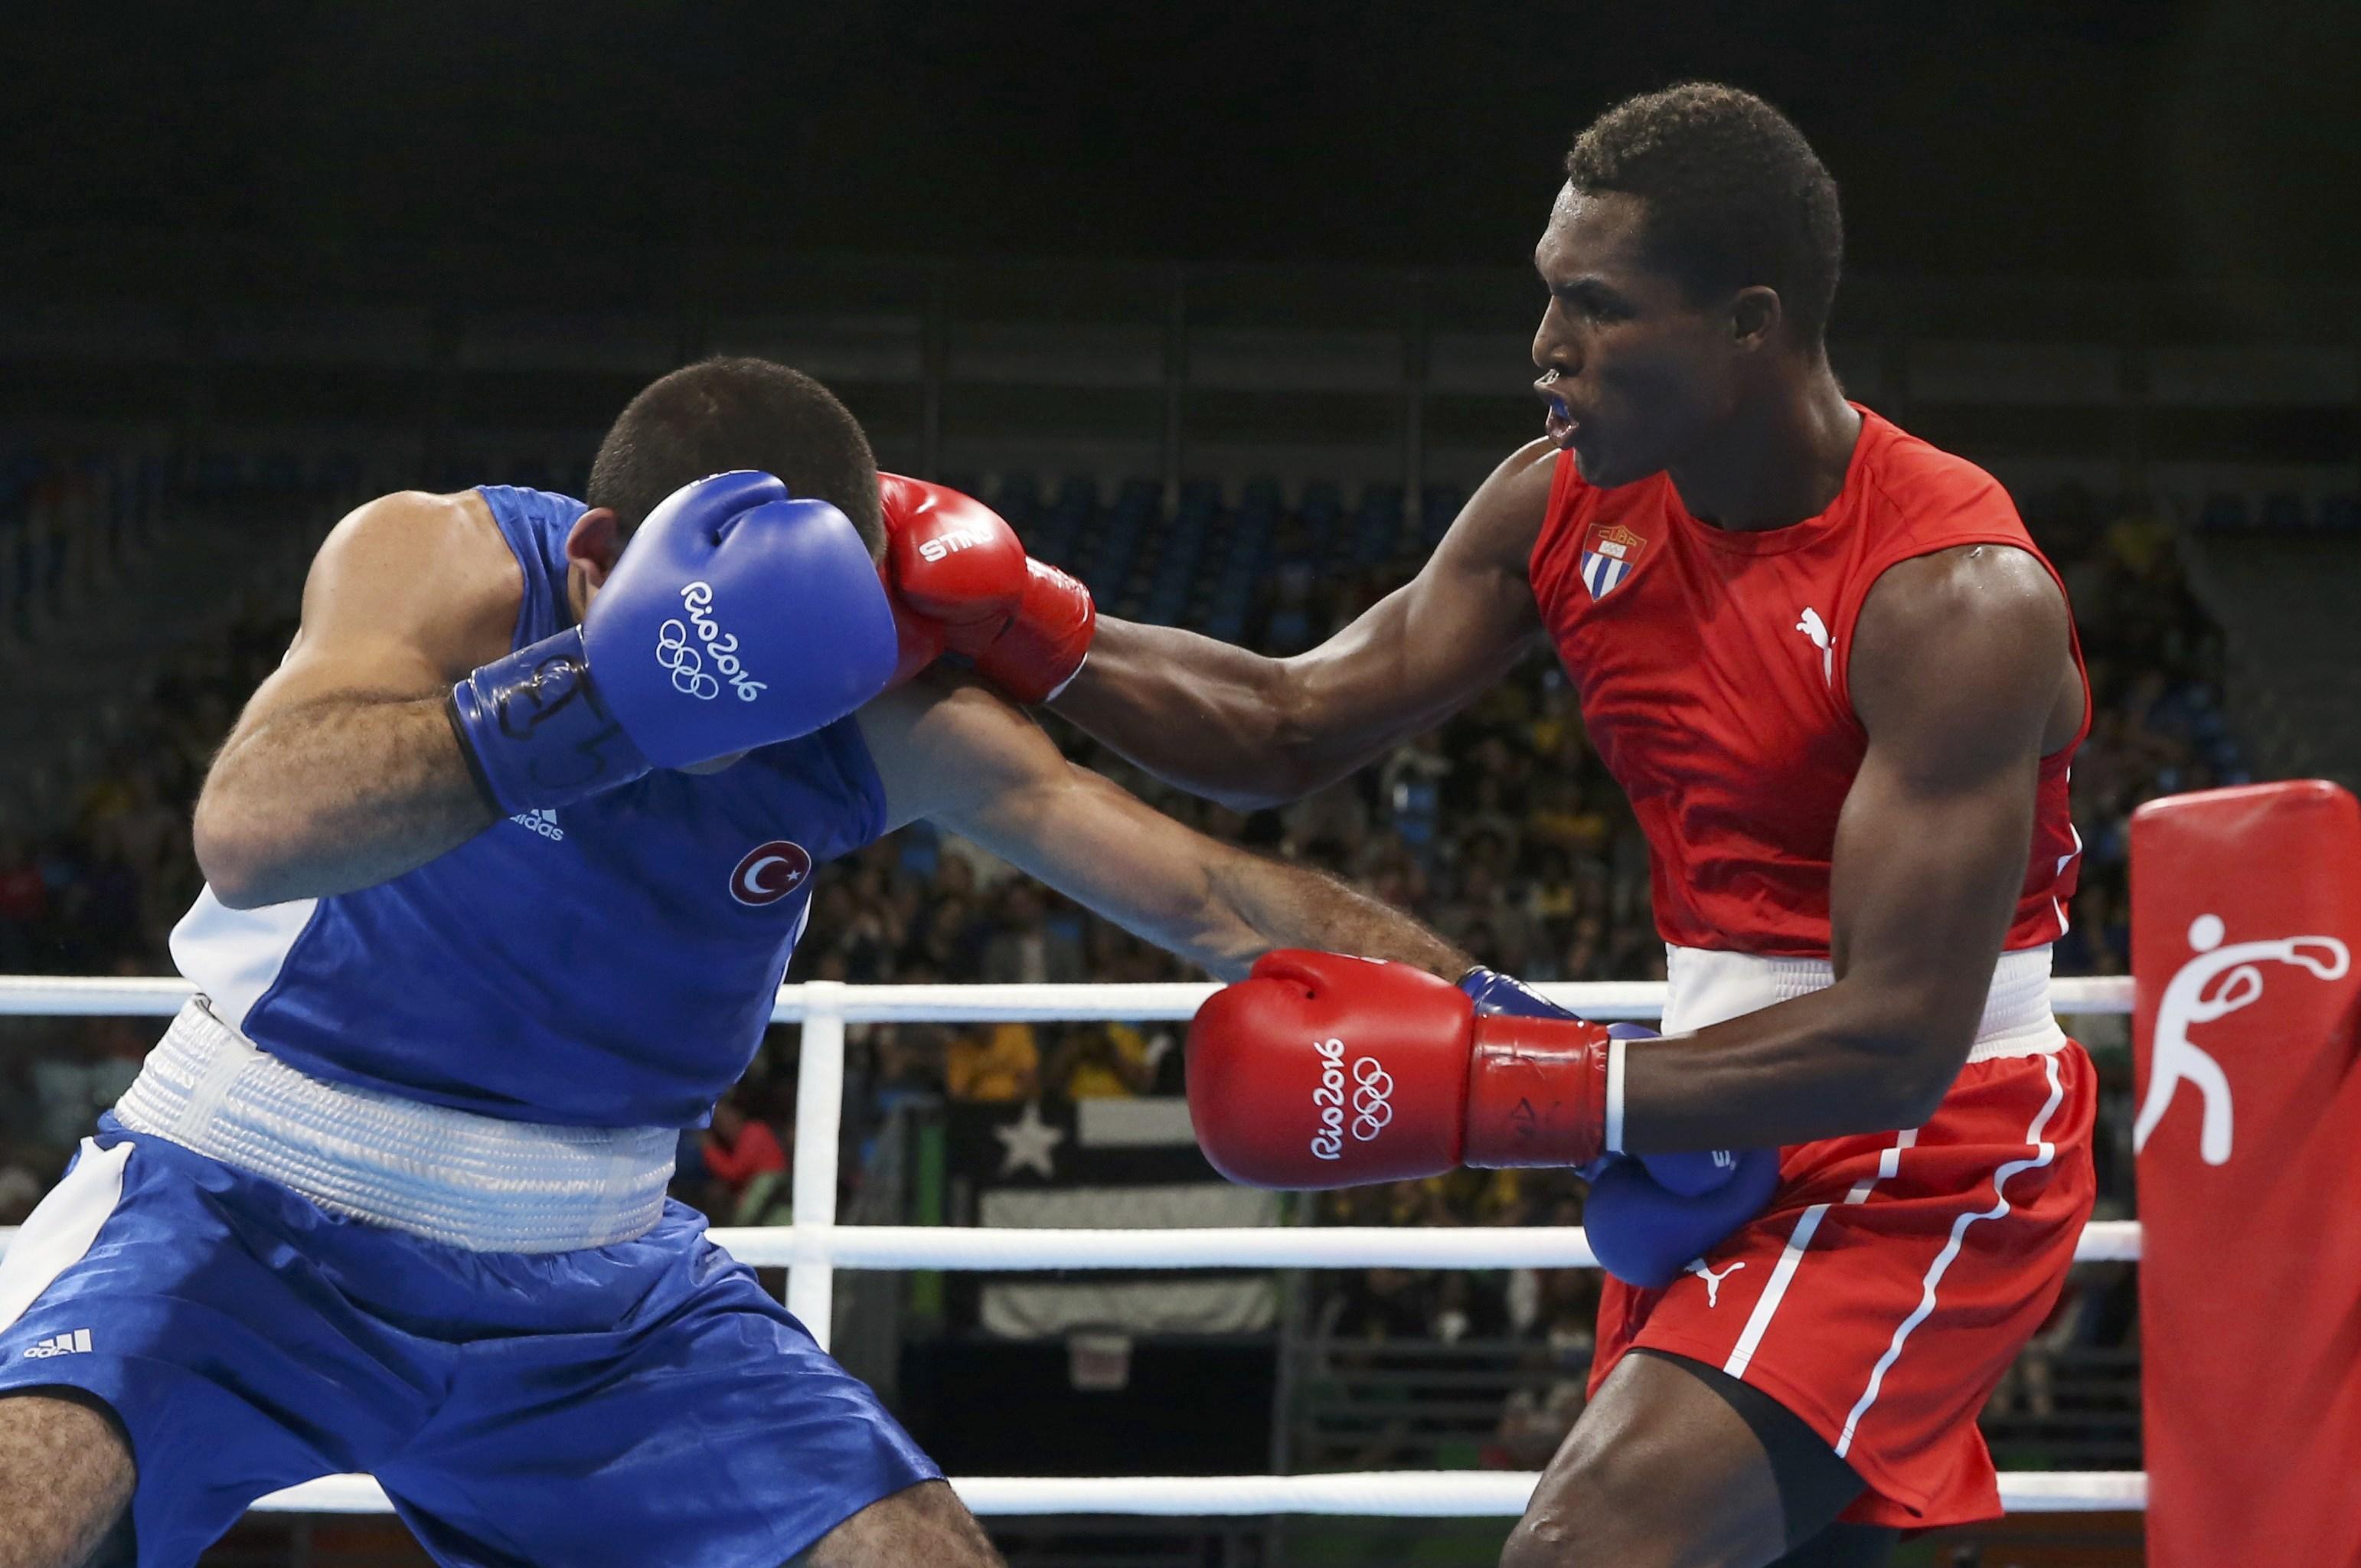 2016 Rio Olympics - Boxing - Preliminary - Men's Light Heavy (81kg) Round of 16 Bout 89 - Riocentro - Pavilion 6 - Rio de Janeiro, Brazil - 10/08/2016. Julio Cesar La Cruz (CUB) of Cuba and Mehmet Nadir Unal (TUR) of Turkey compete. REUTERS/Adrees Latif